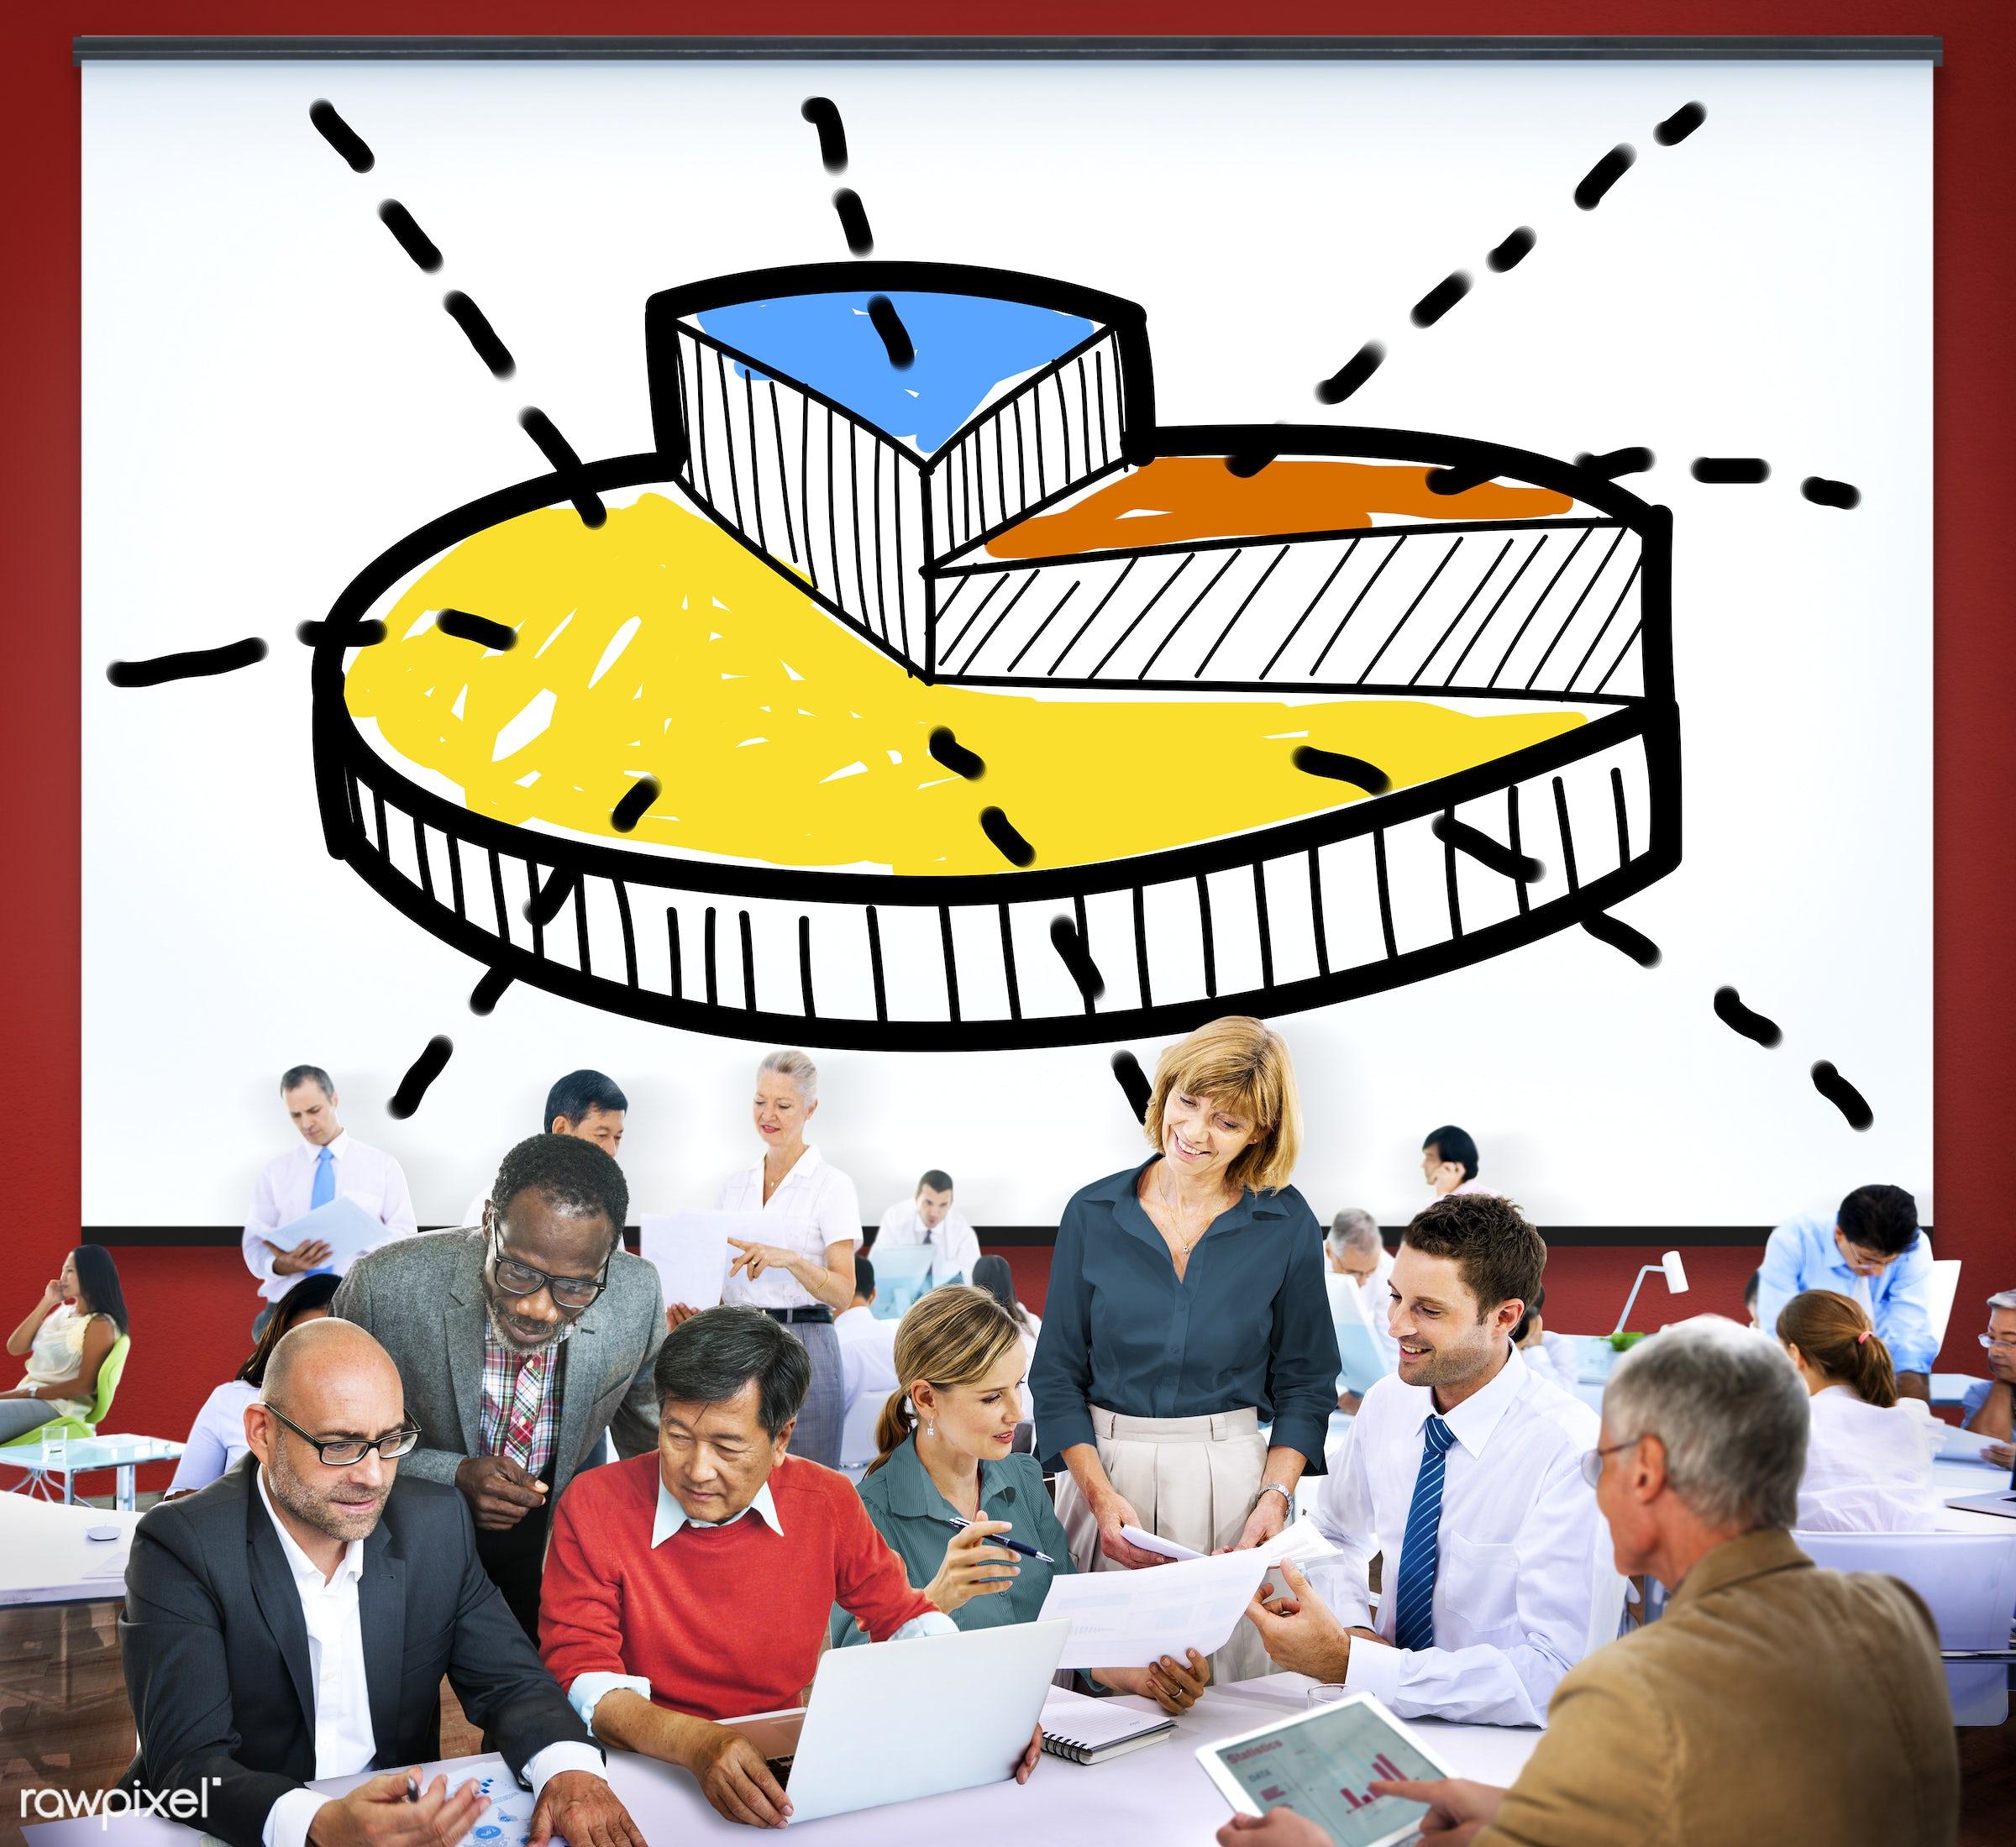 analysing, analysis, analytics, bar graph, business, business people, businessmen, businesswomen, busy, chart, communication...